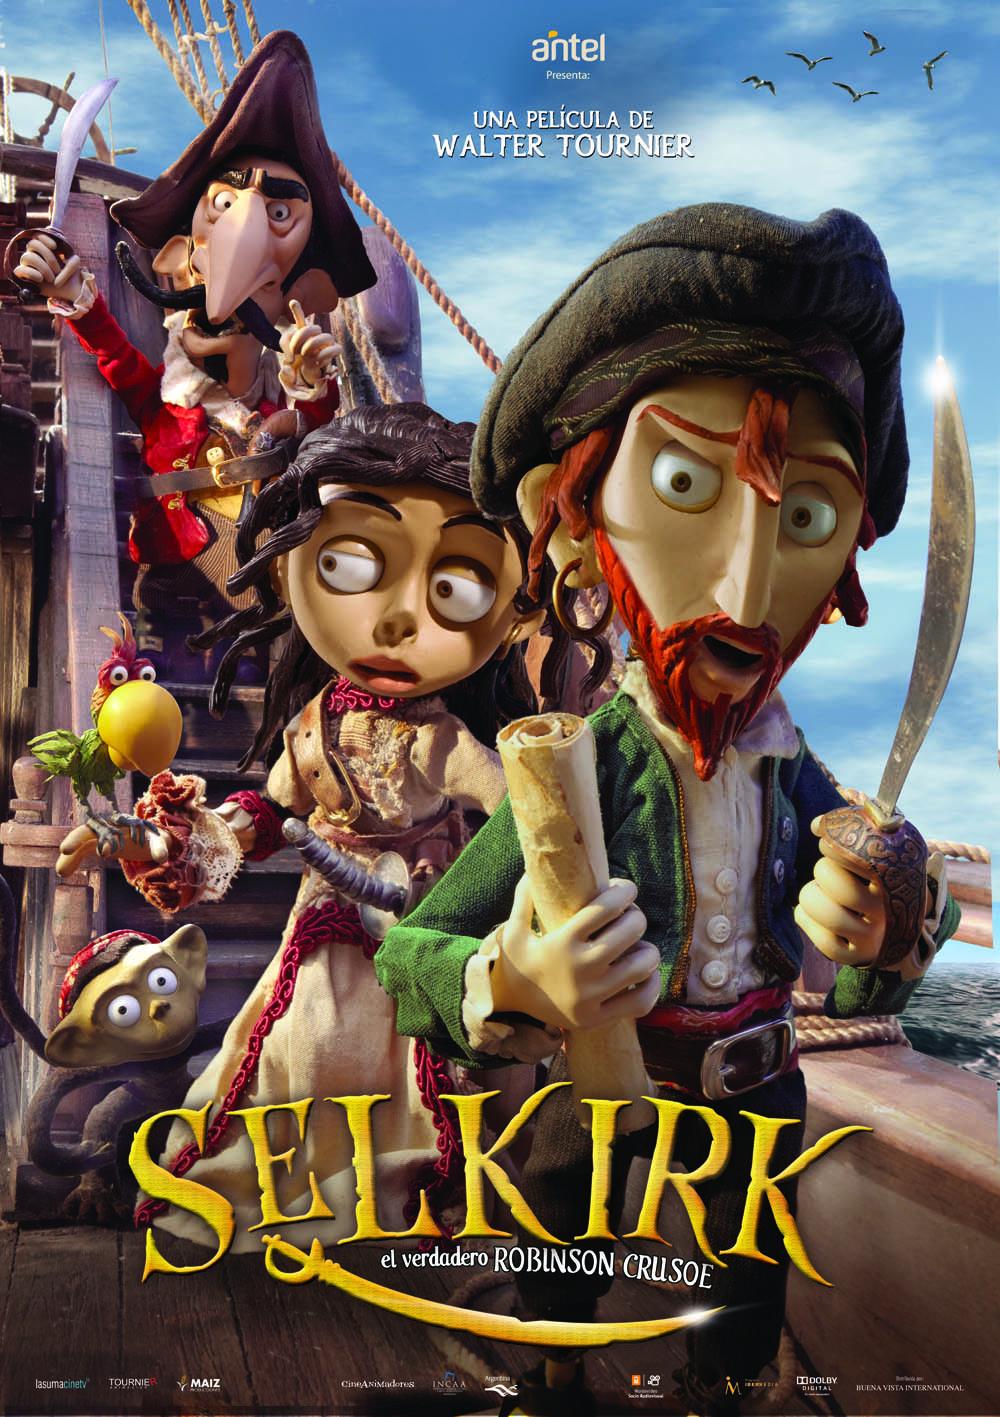 Selkirk, o Verdadeiro Robinson Crusoe – Dublado (2012)